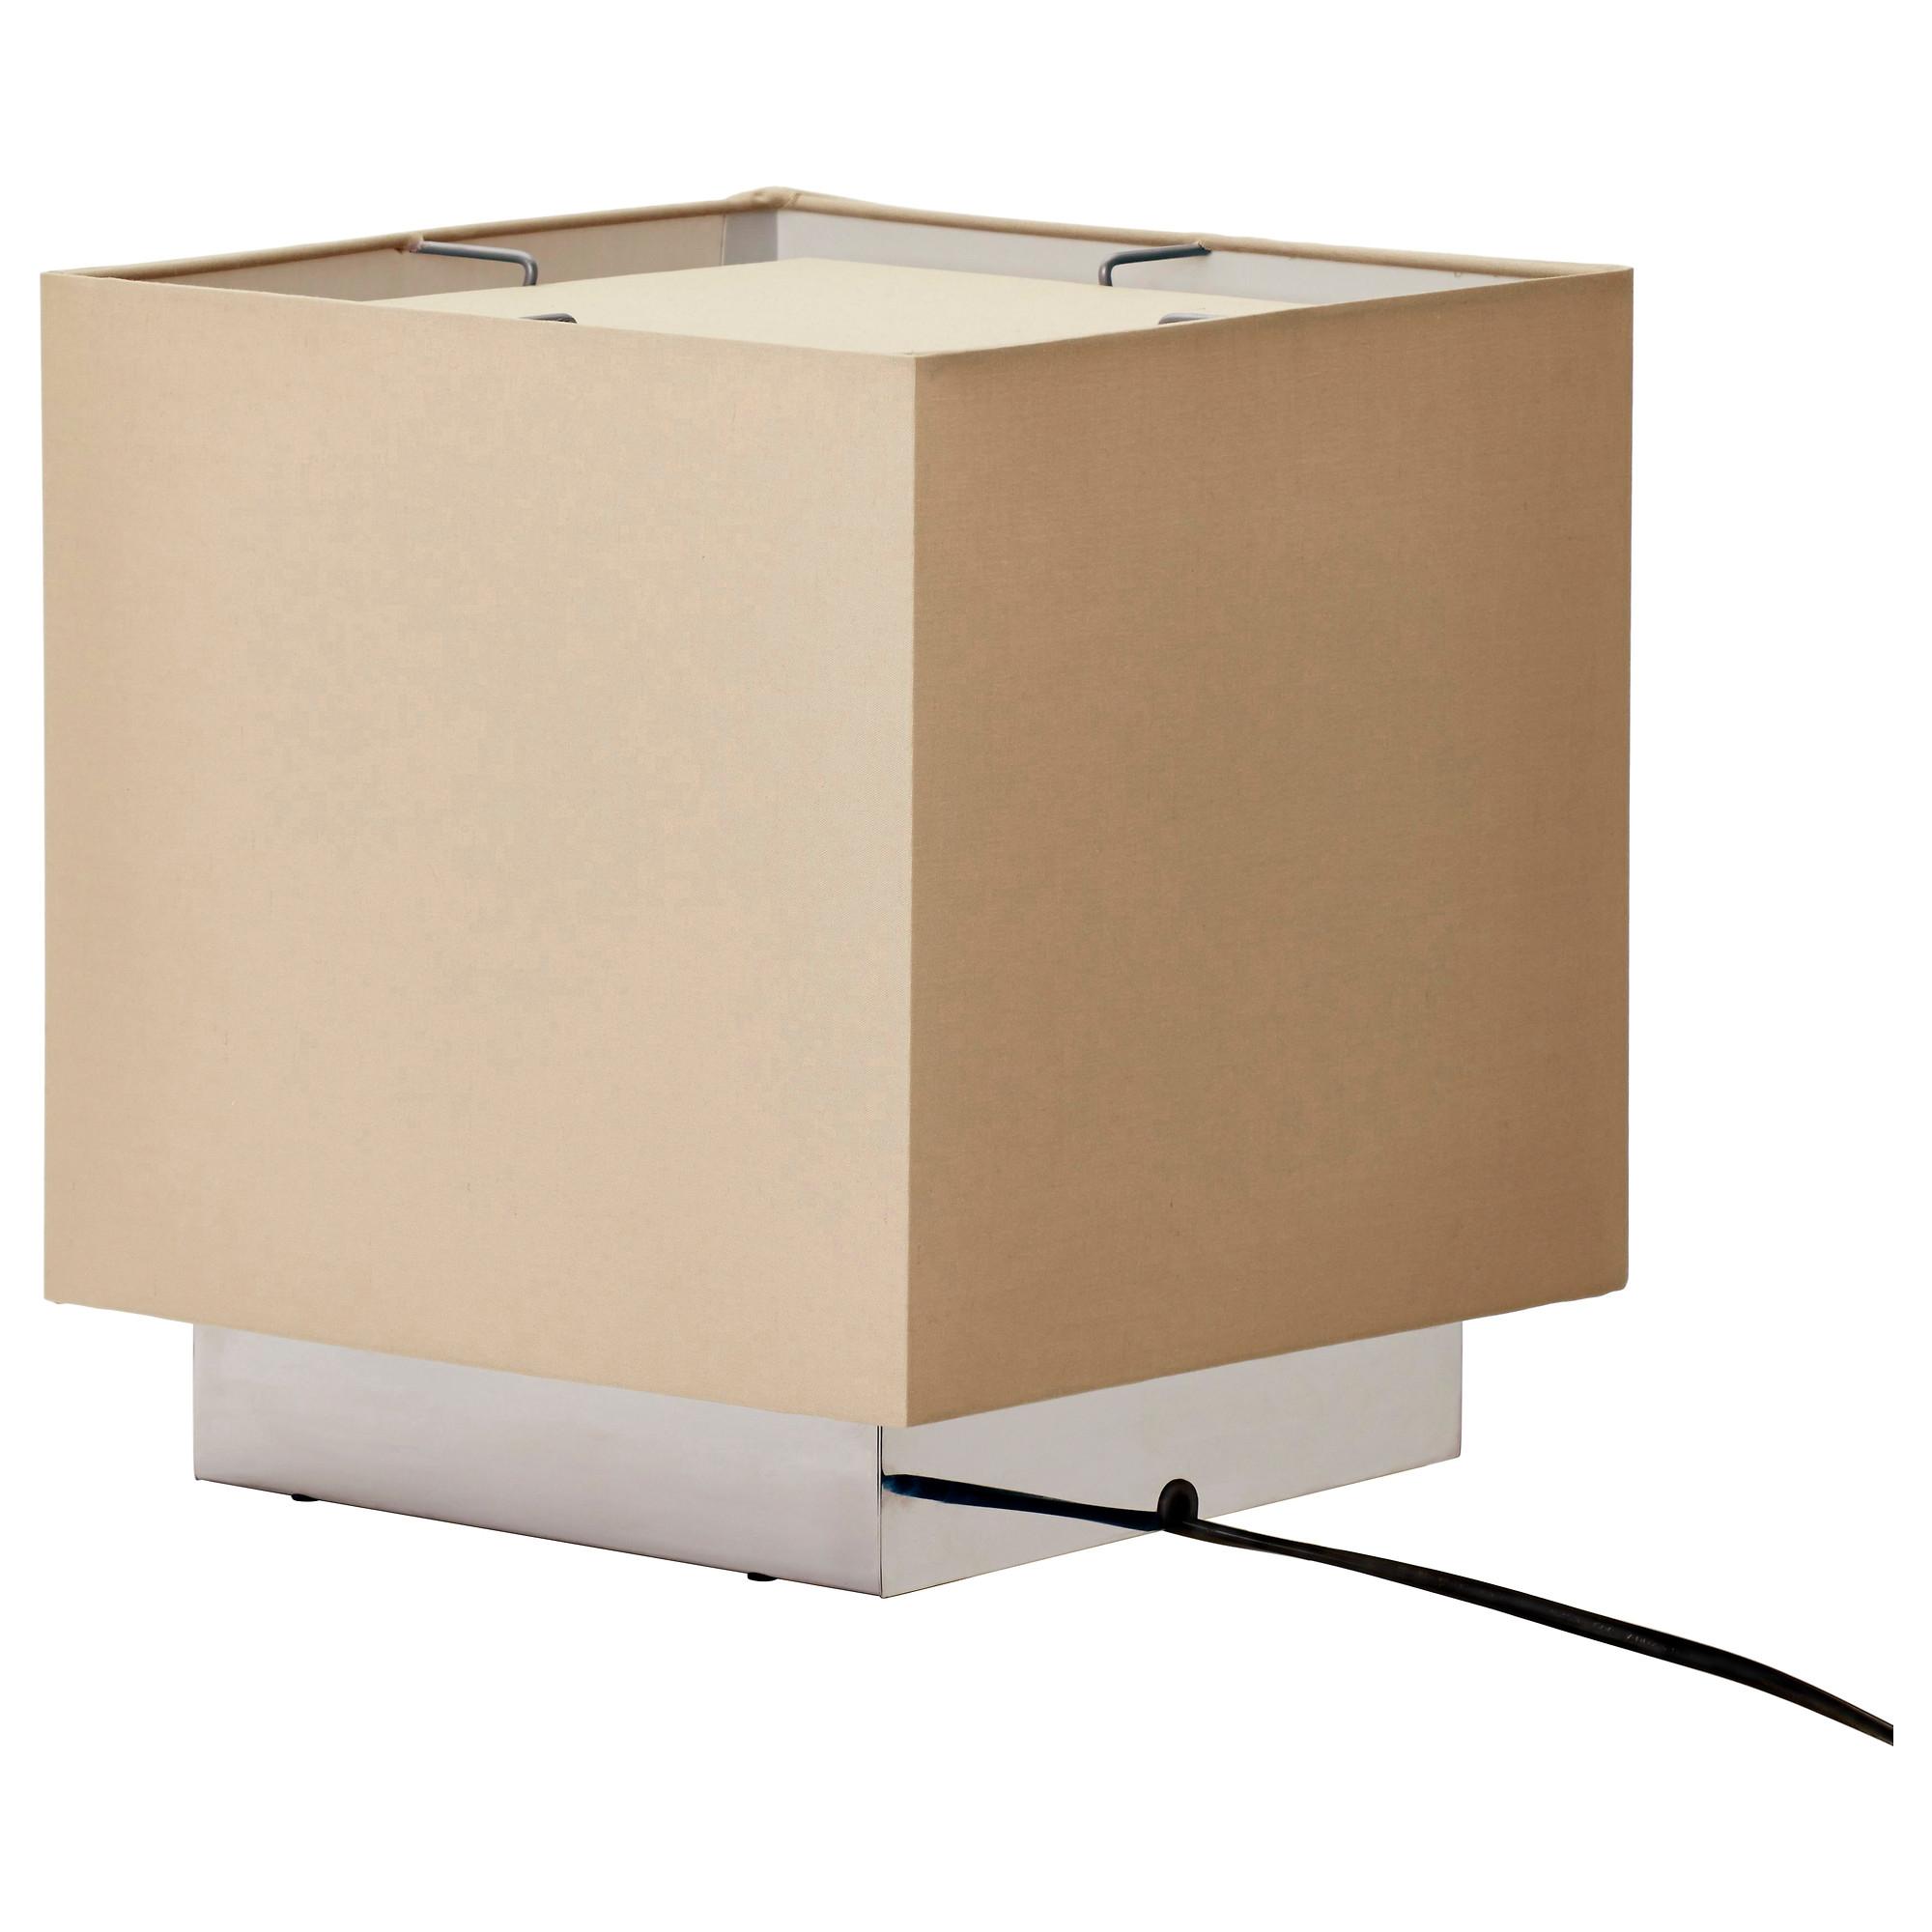 Decoracion mueble sofa lamparas tenerife - Lamparas tenerife ...